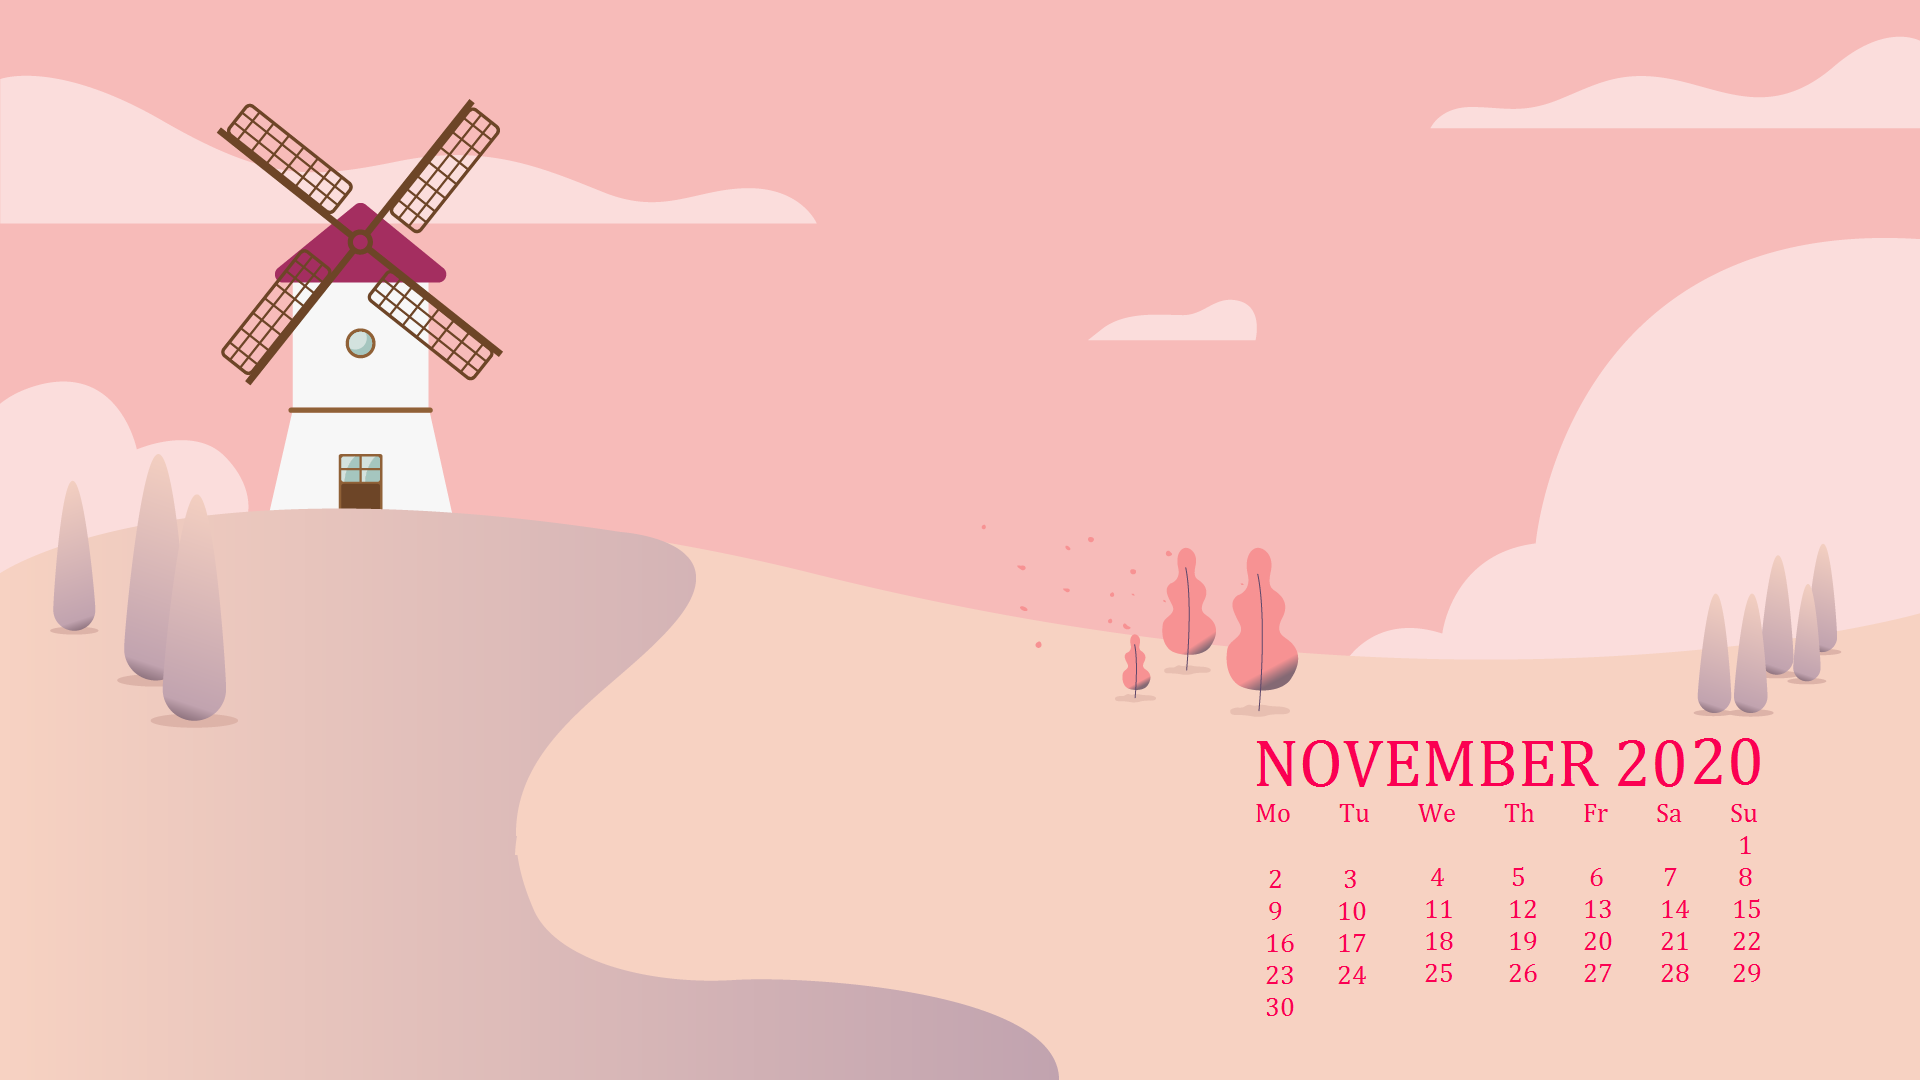 November 2020 Calendar Wallpaper